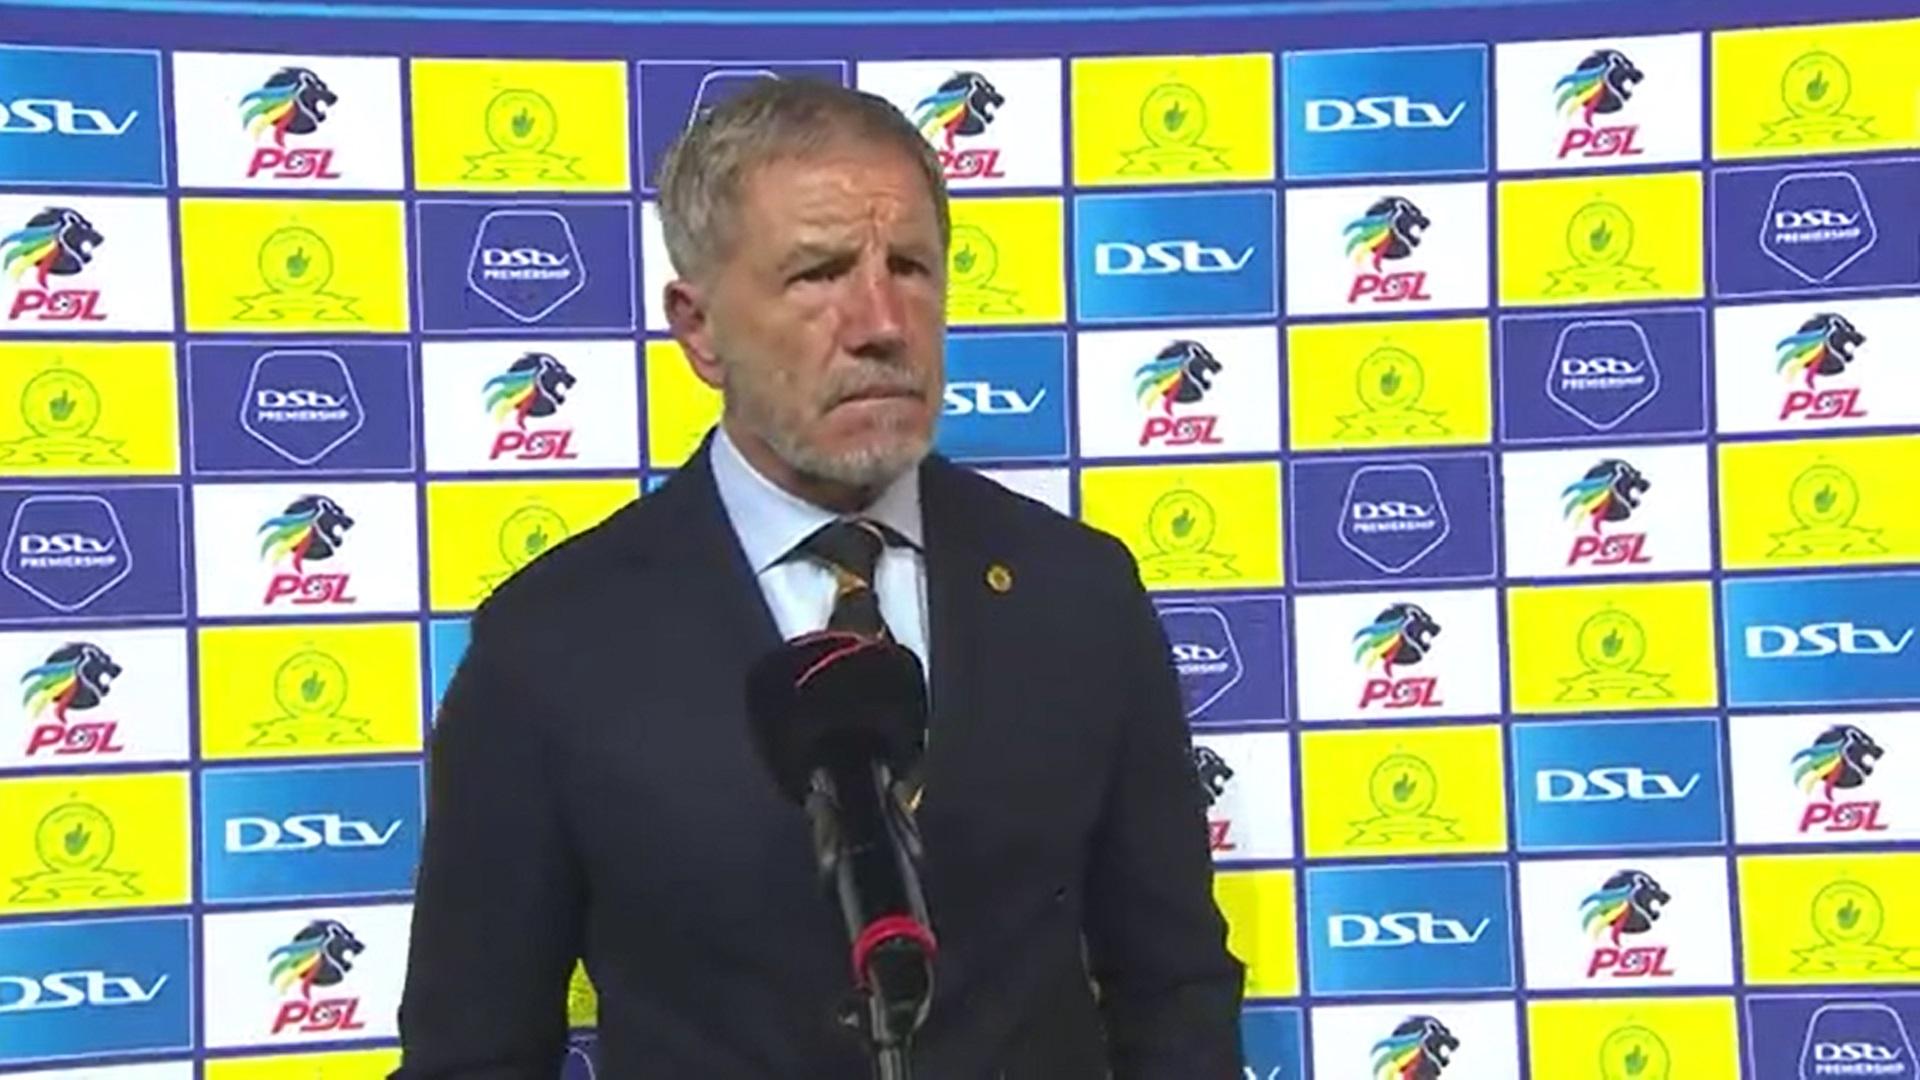 DStv Premiership | Mamelodi Sundowns v Kaizer Chiefs | Post-match interview with Stuart Baxter